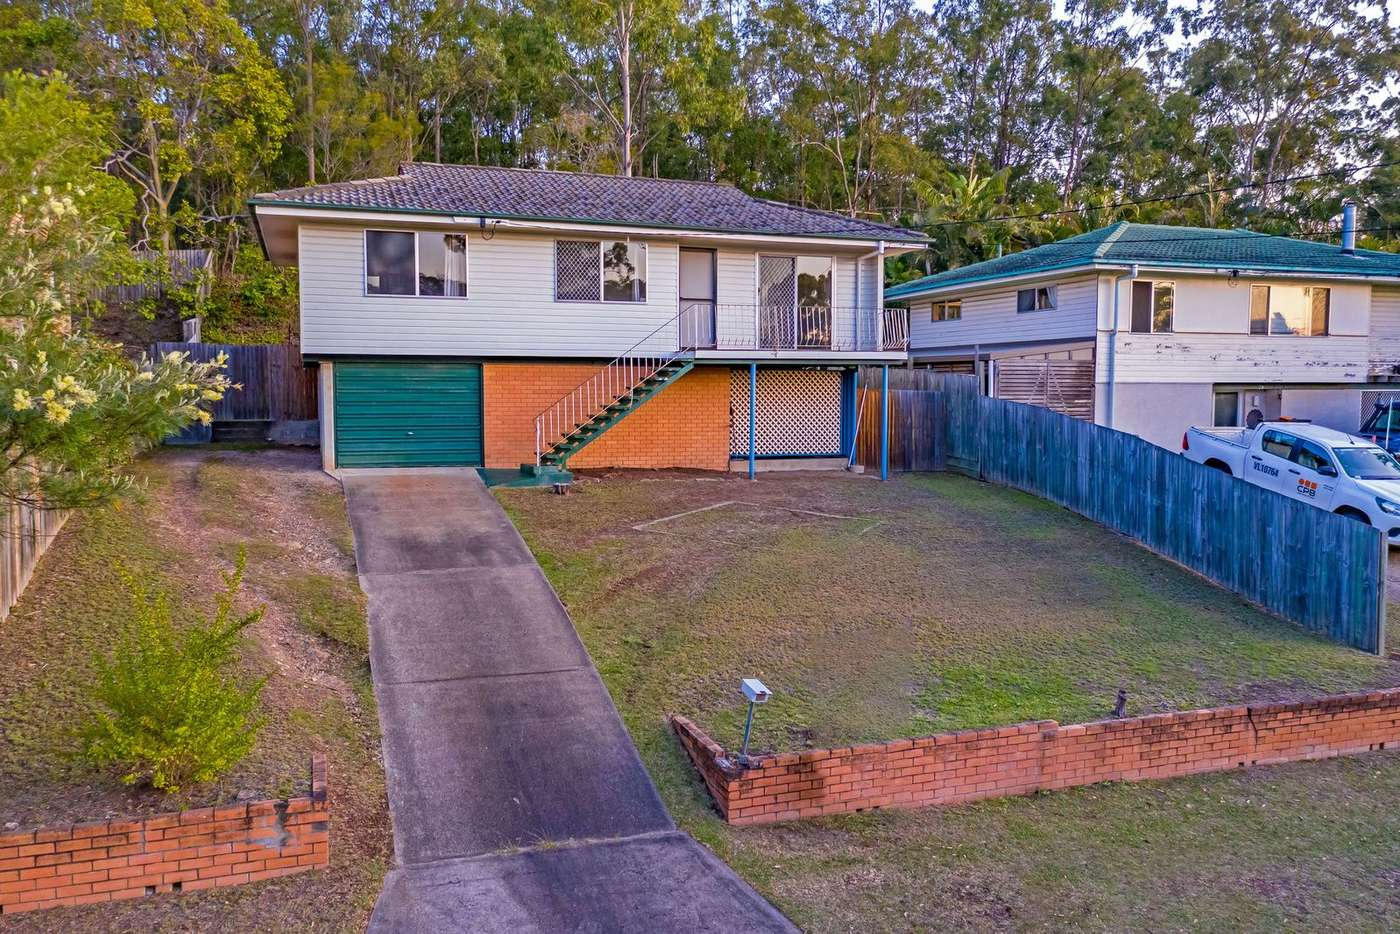 Main view of Homely house listing, 26 Verbena Street, Mount Gravatt QLD 4122